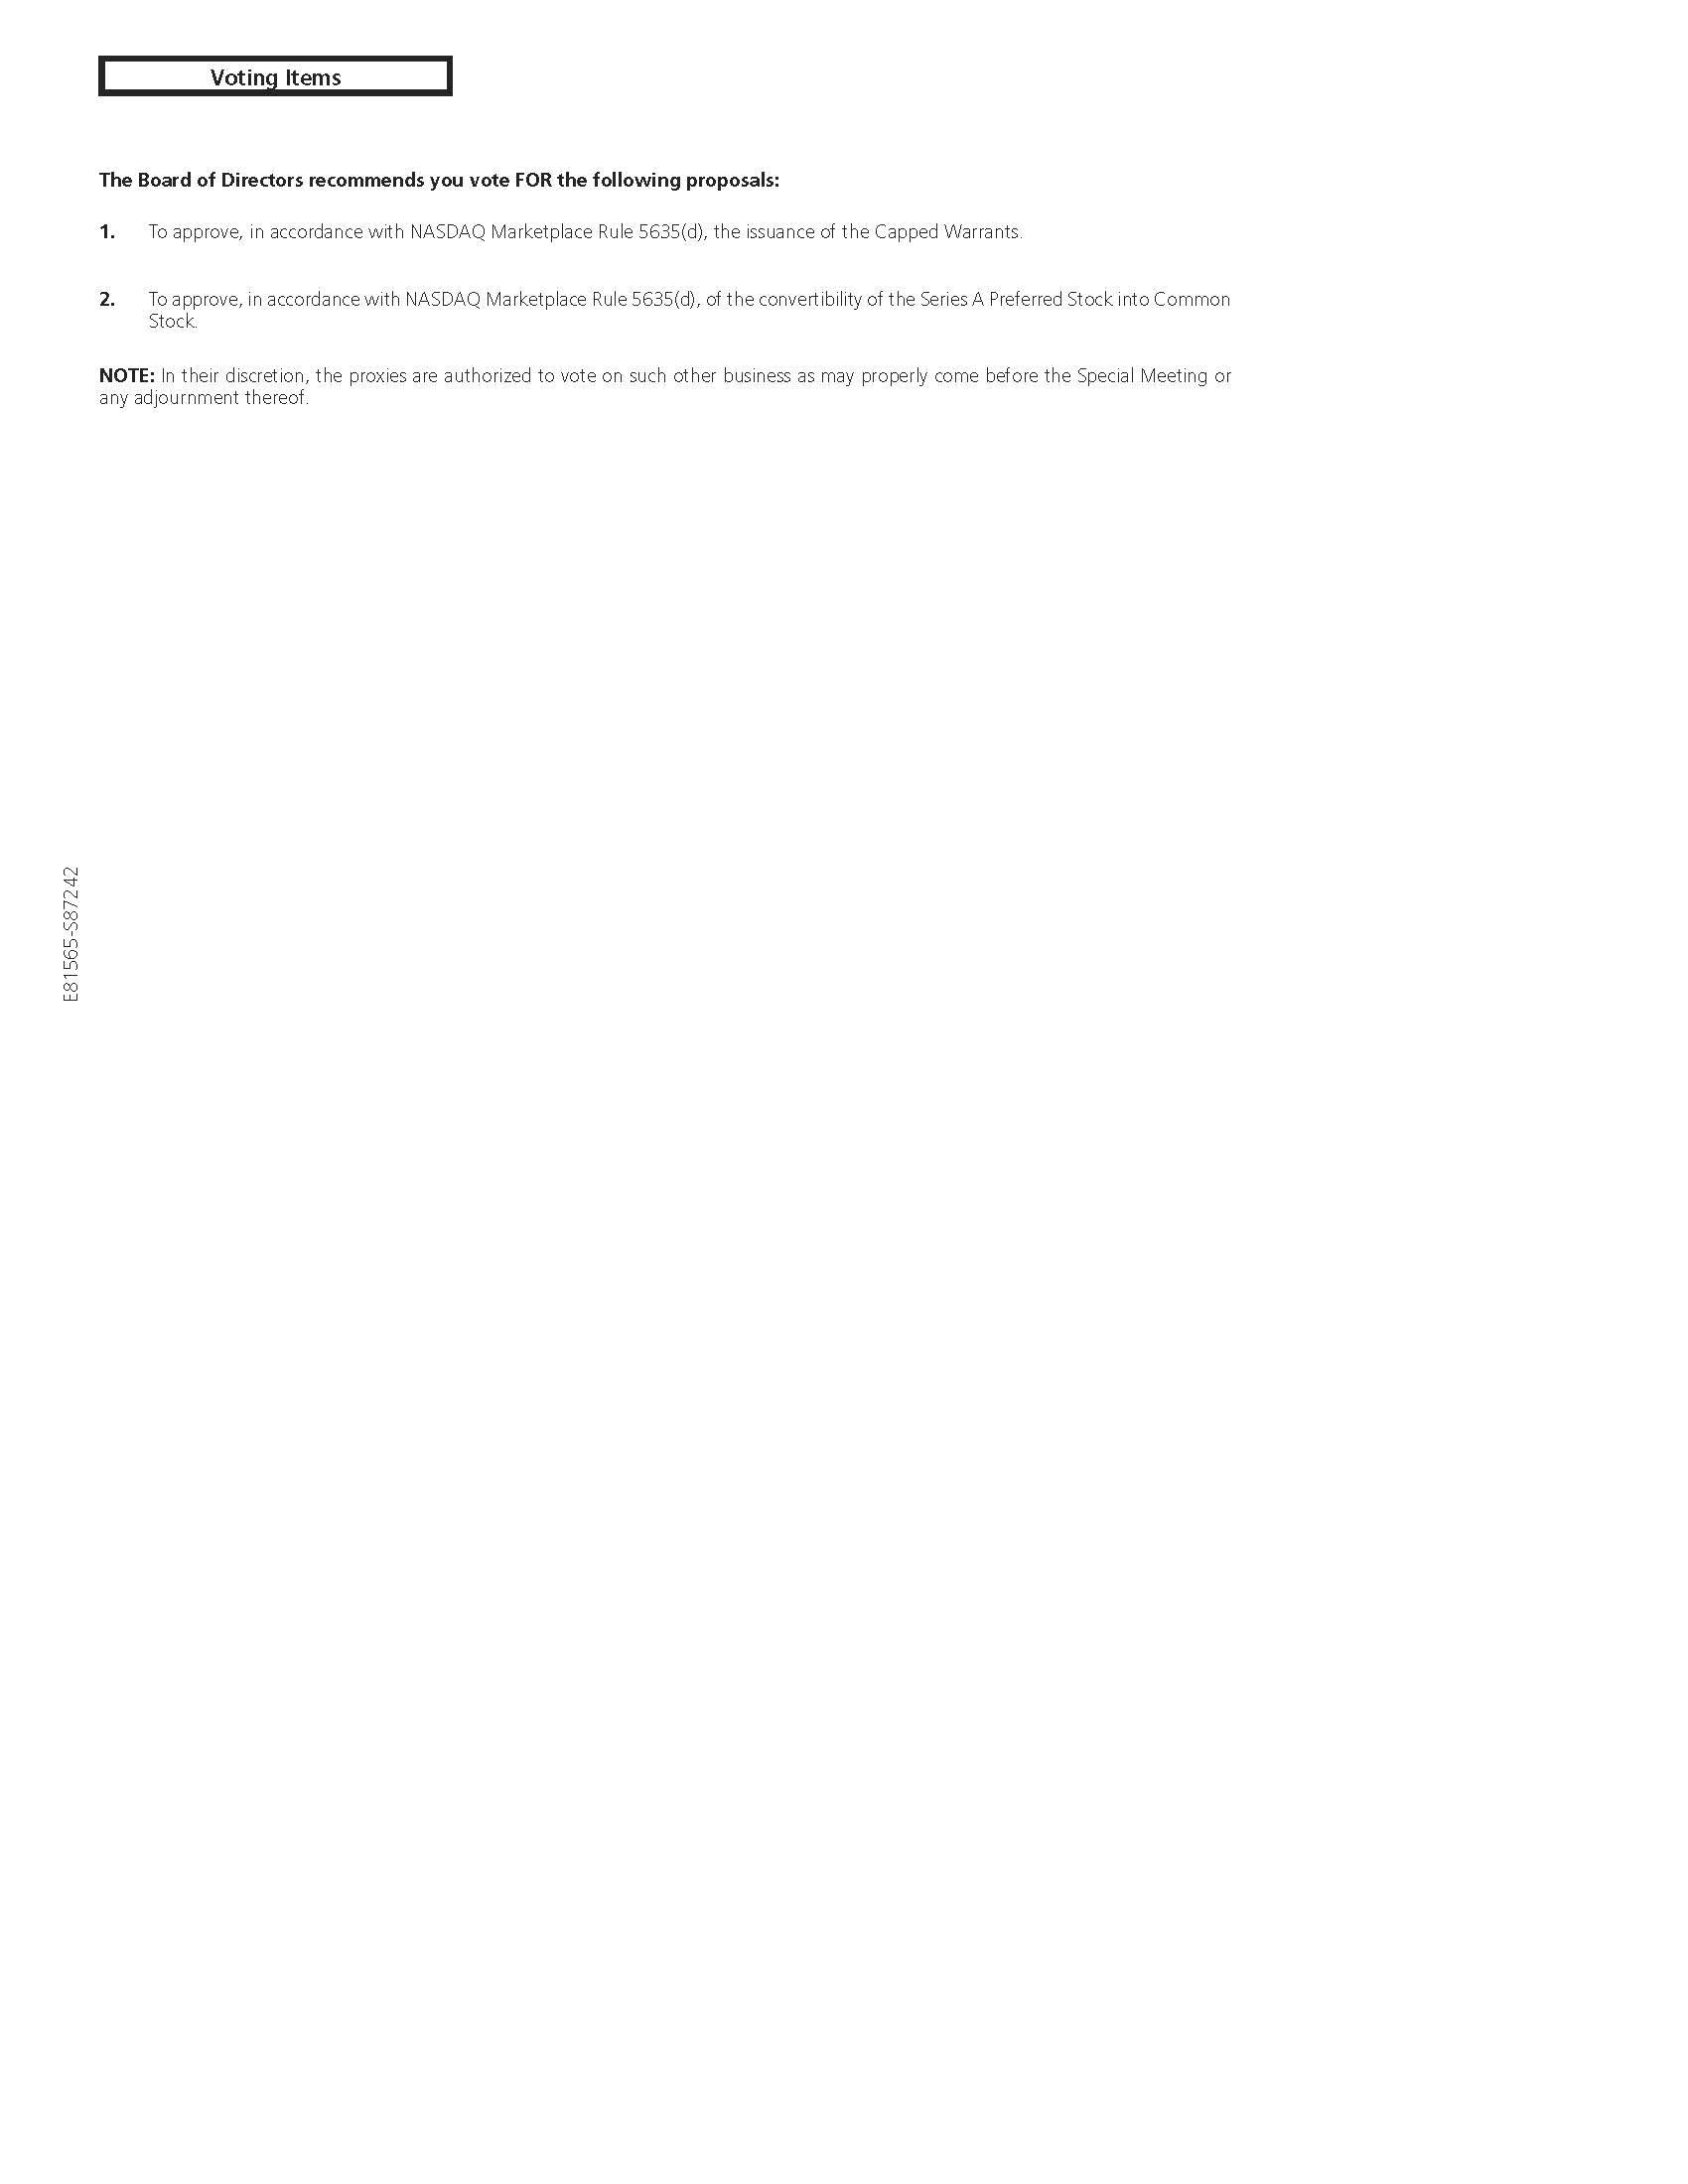 https://cdn.kscope.io/8dc9e4eb382783160b73dc417476d64b-ieapage3sm2019.jpg